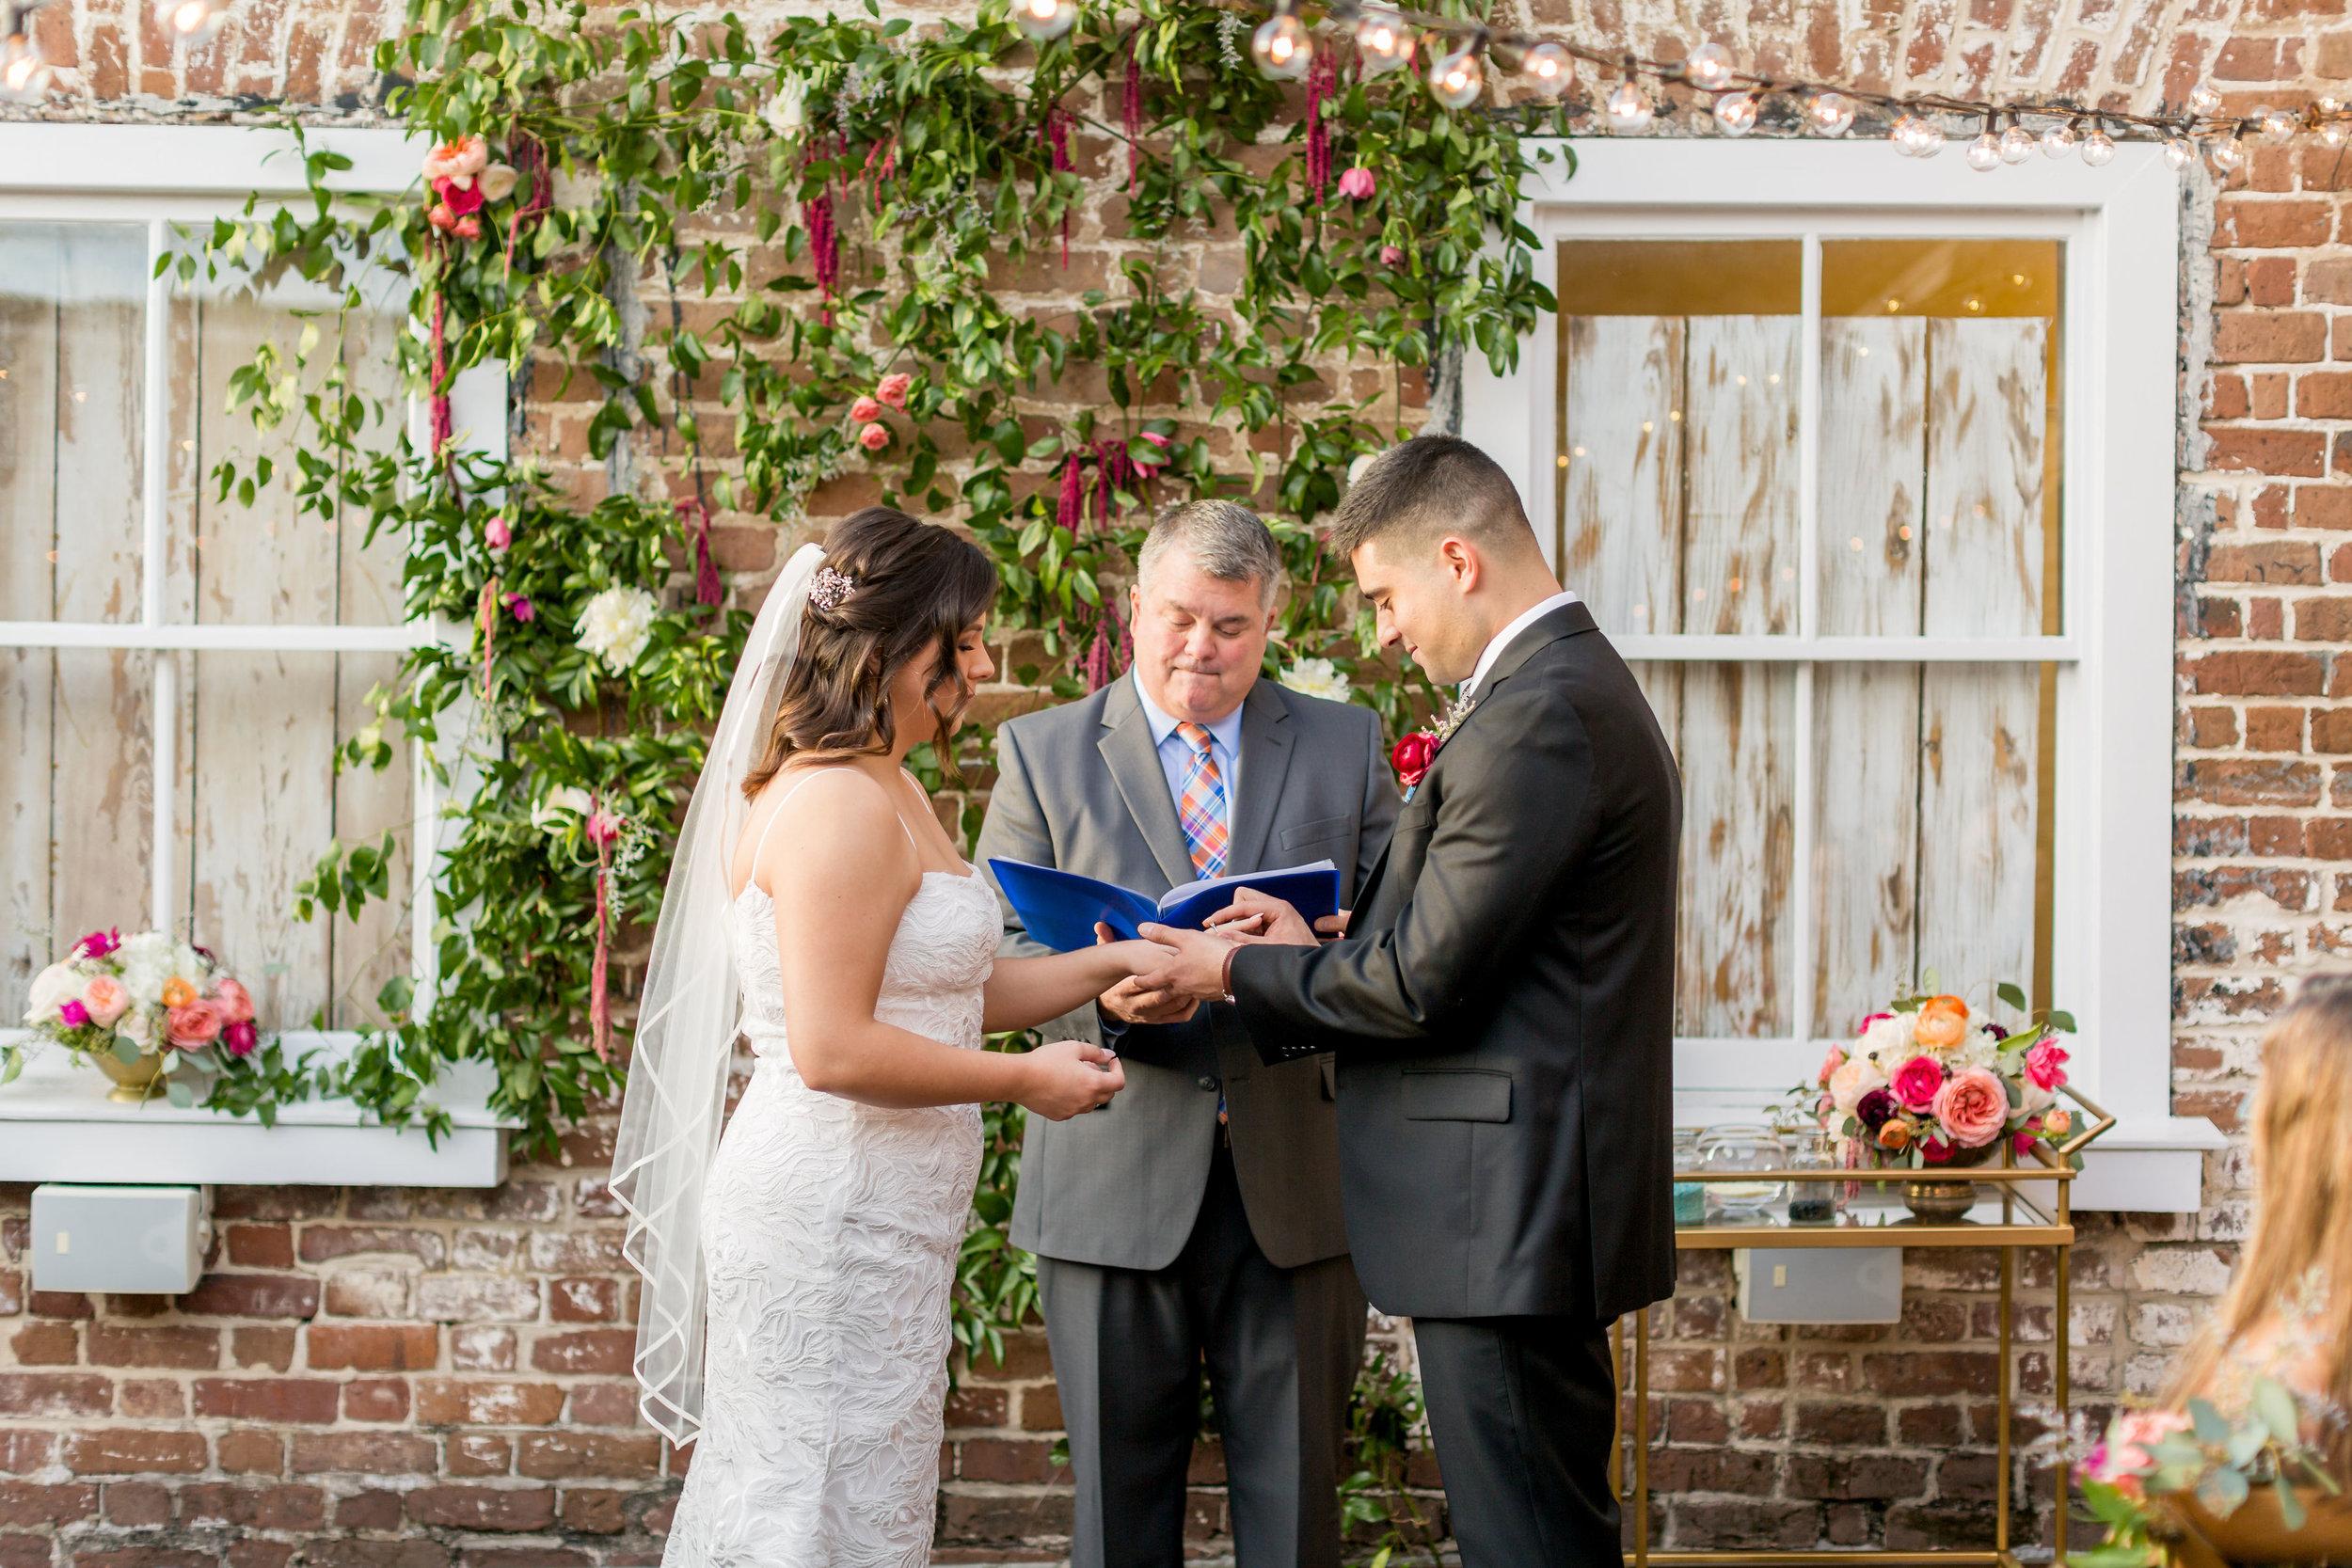 charleston new years elopement popup surprise wedding at upstairs at midtown - scarlet plan & design wedding planners (64).jpg